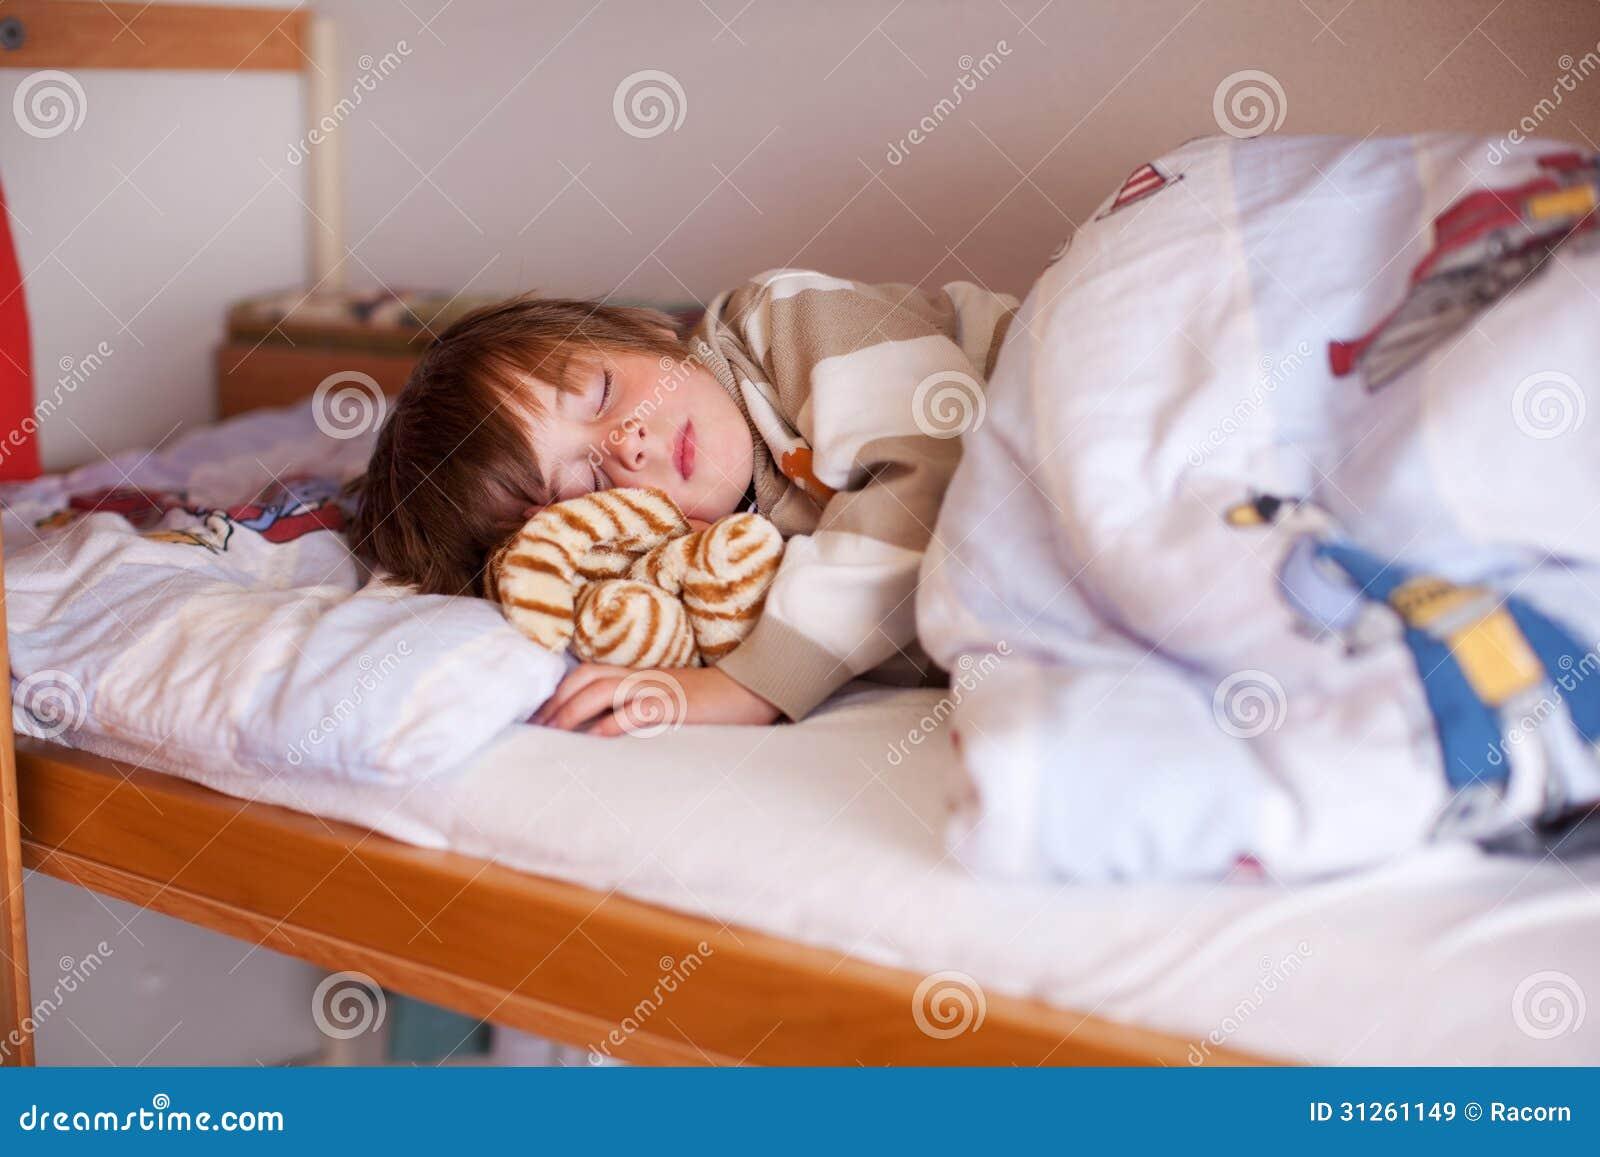 Фото дети на постели